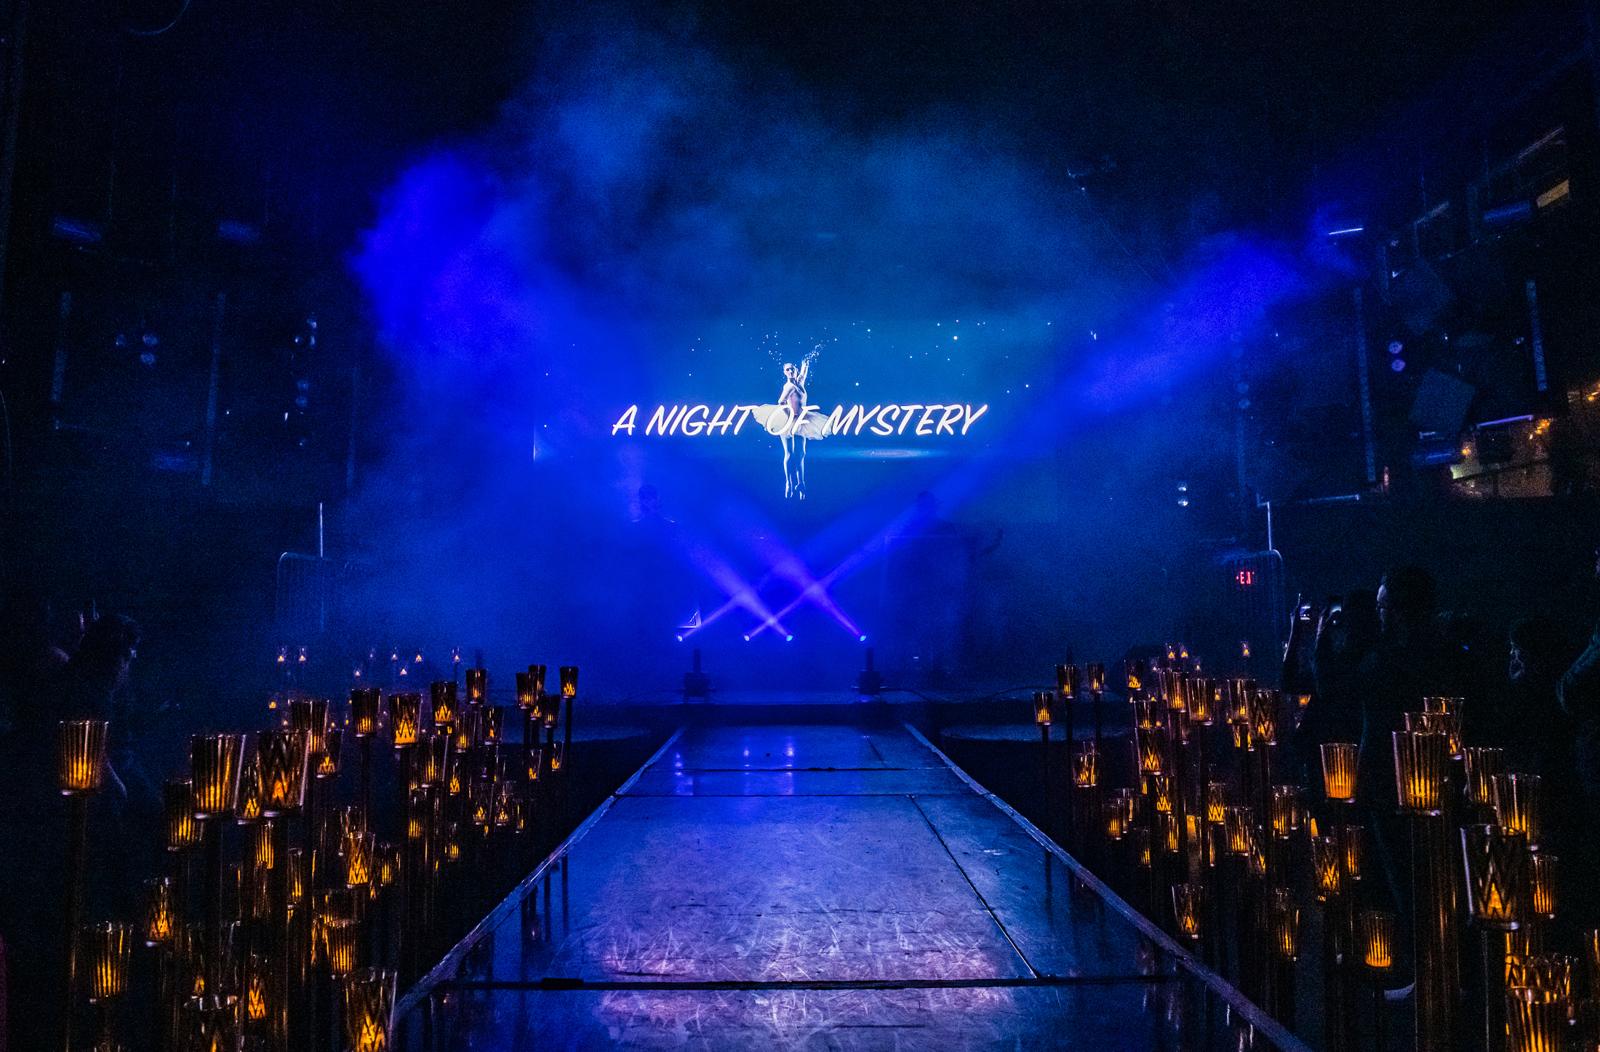 night-of-mystery-ace-spfstudios-3382-X3.jpg